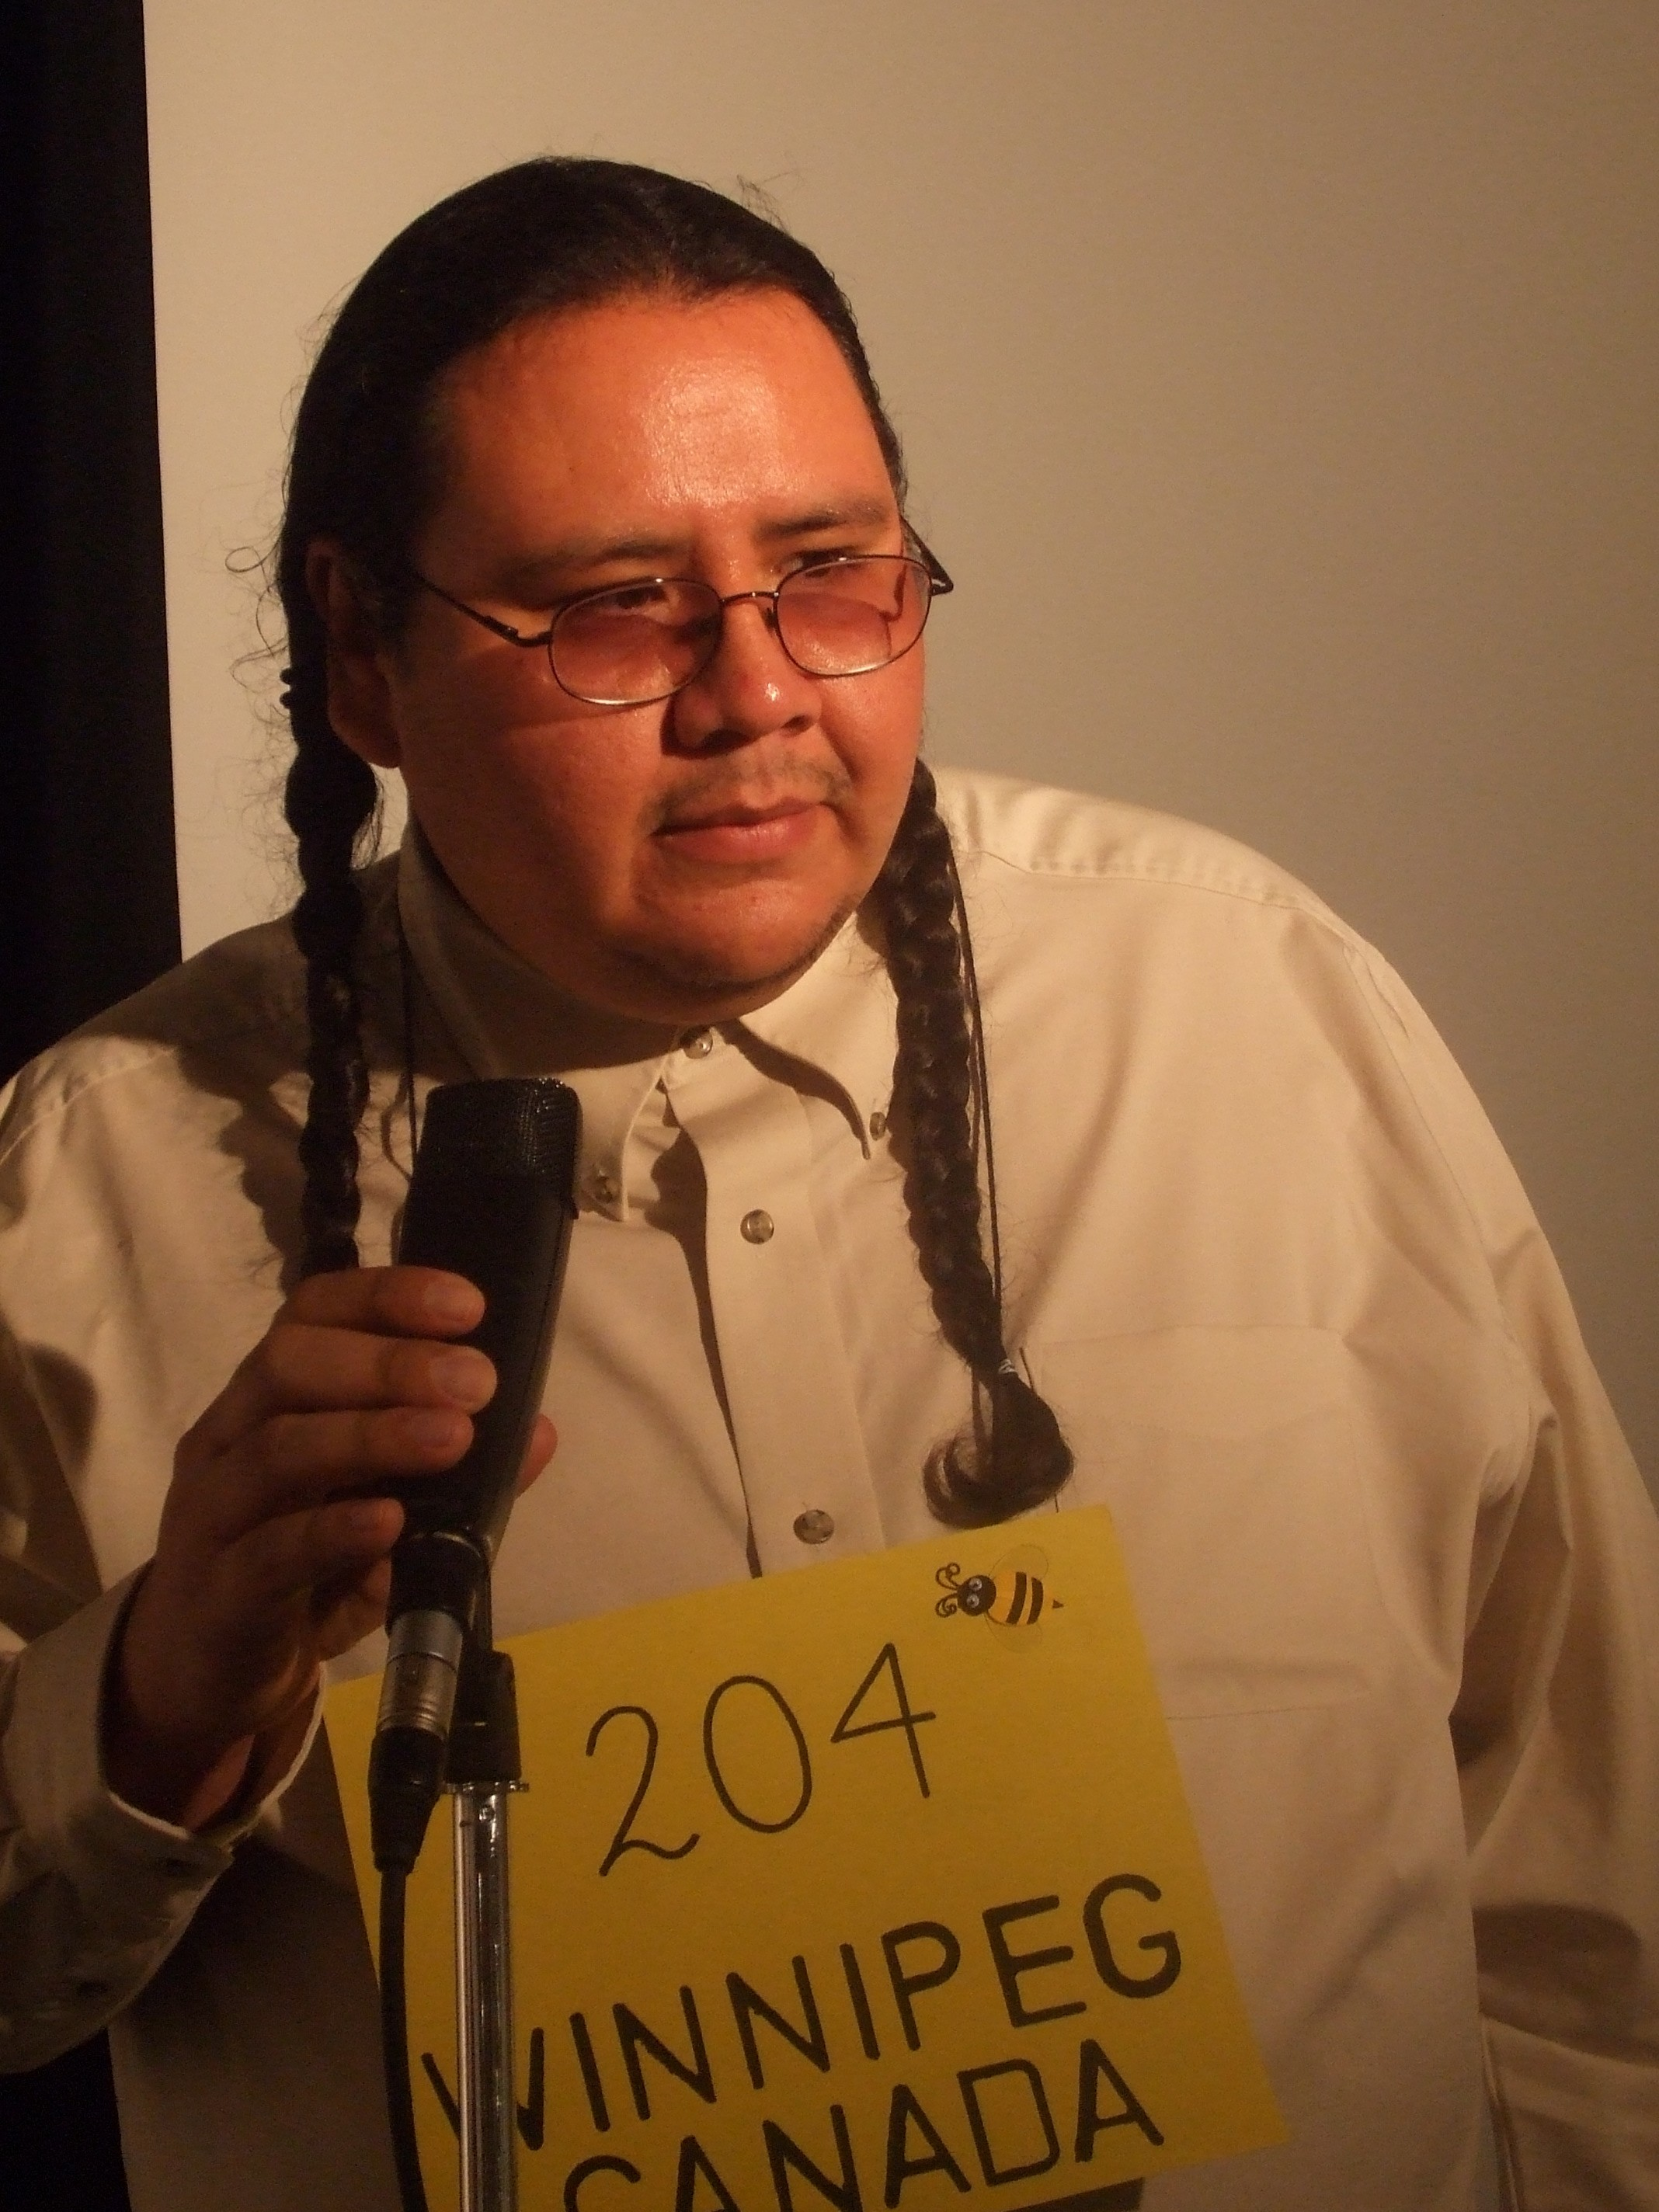 Indian Darryl Nepinak, Winnipeg